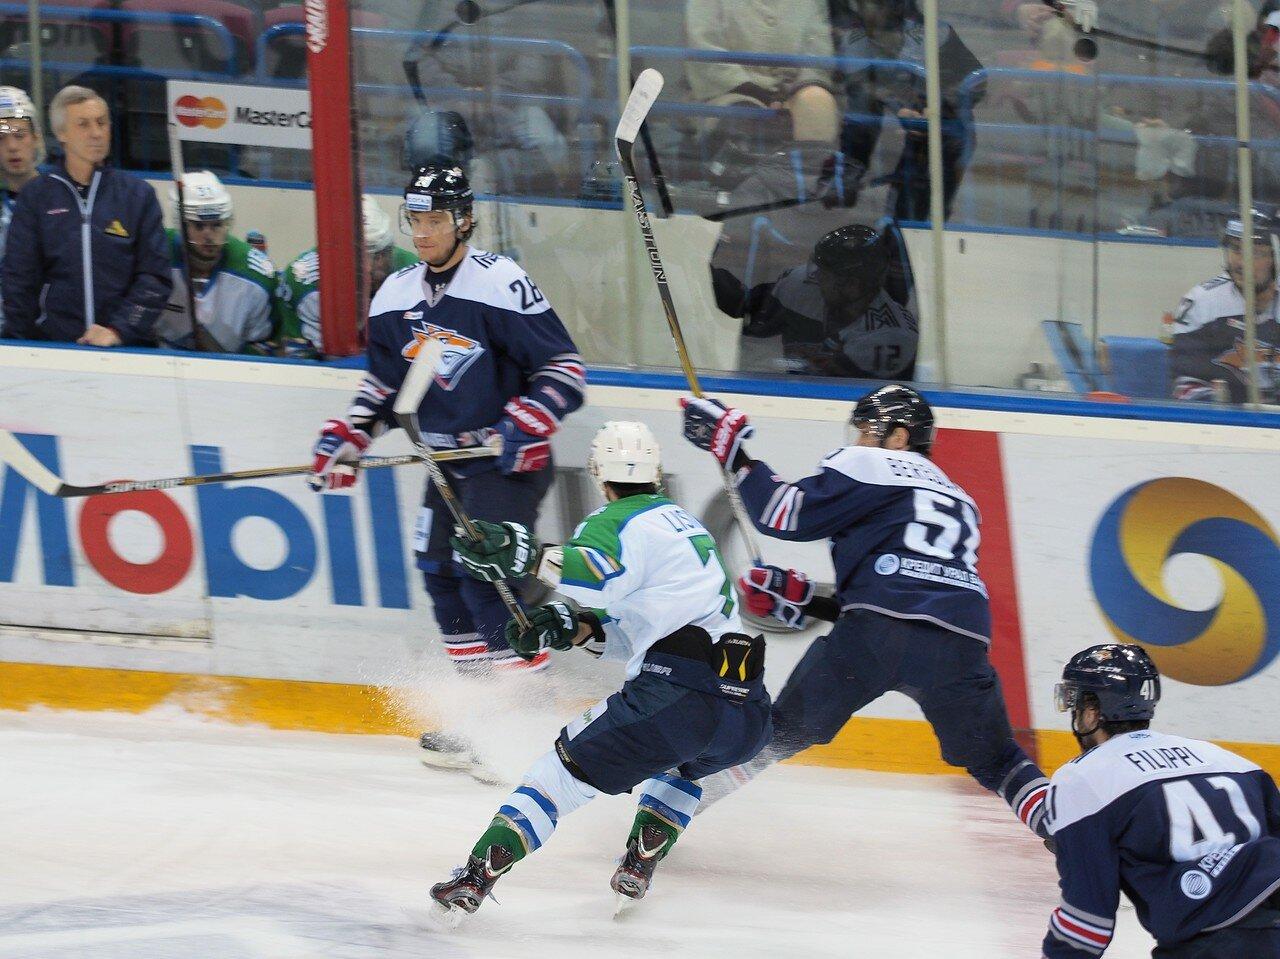 85Плей-офф 2016 Восток Финал Металлург - Салават Юлаев 23.03.2016